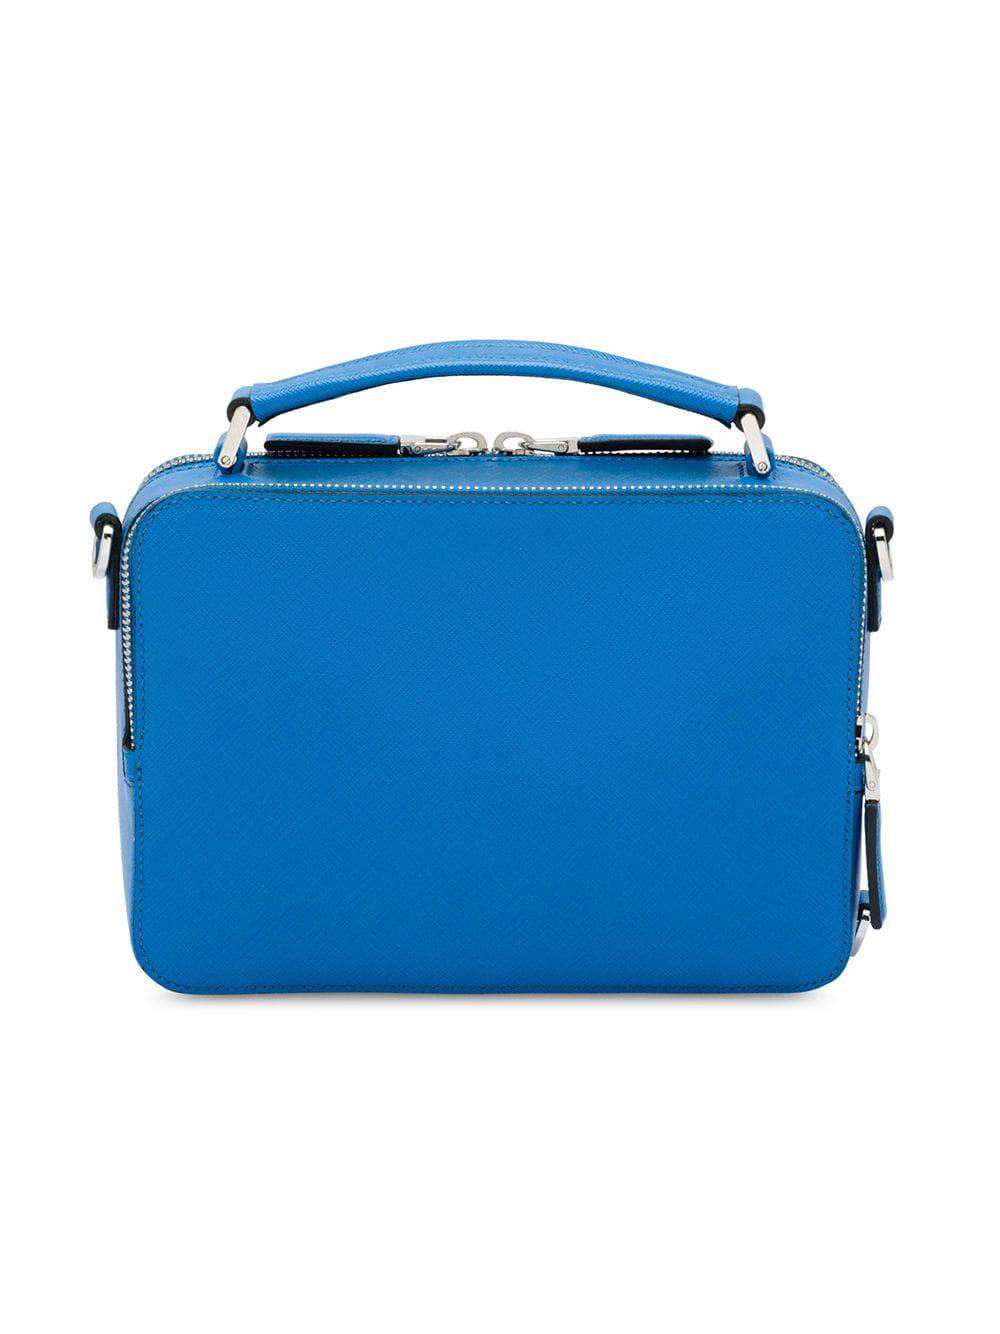 2b205eb4d75e Lyst - Prada Saffiano Leather Shoulder Bag in Blue for Men